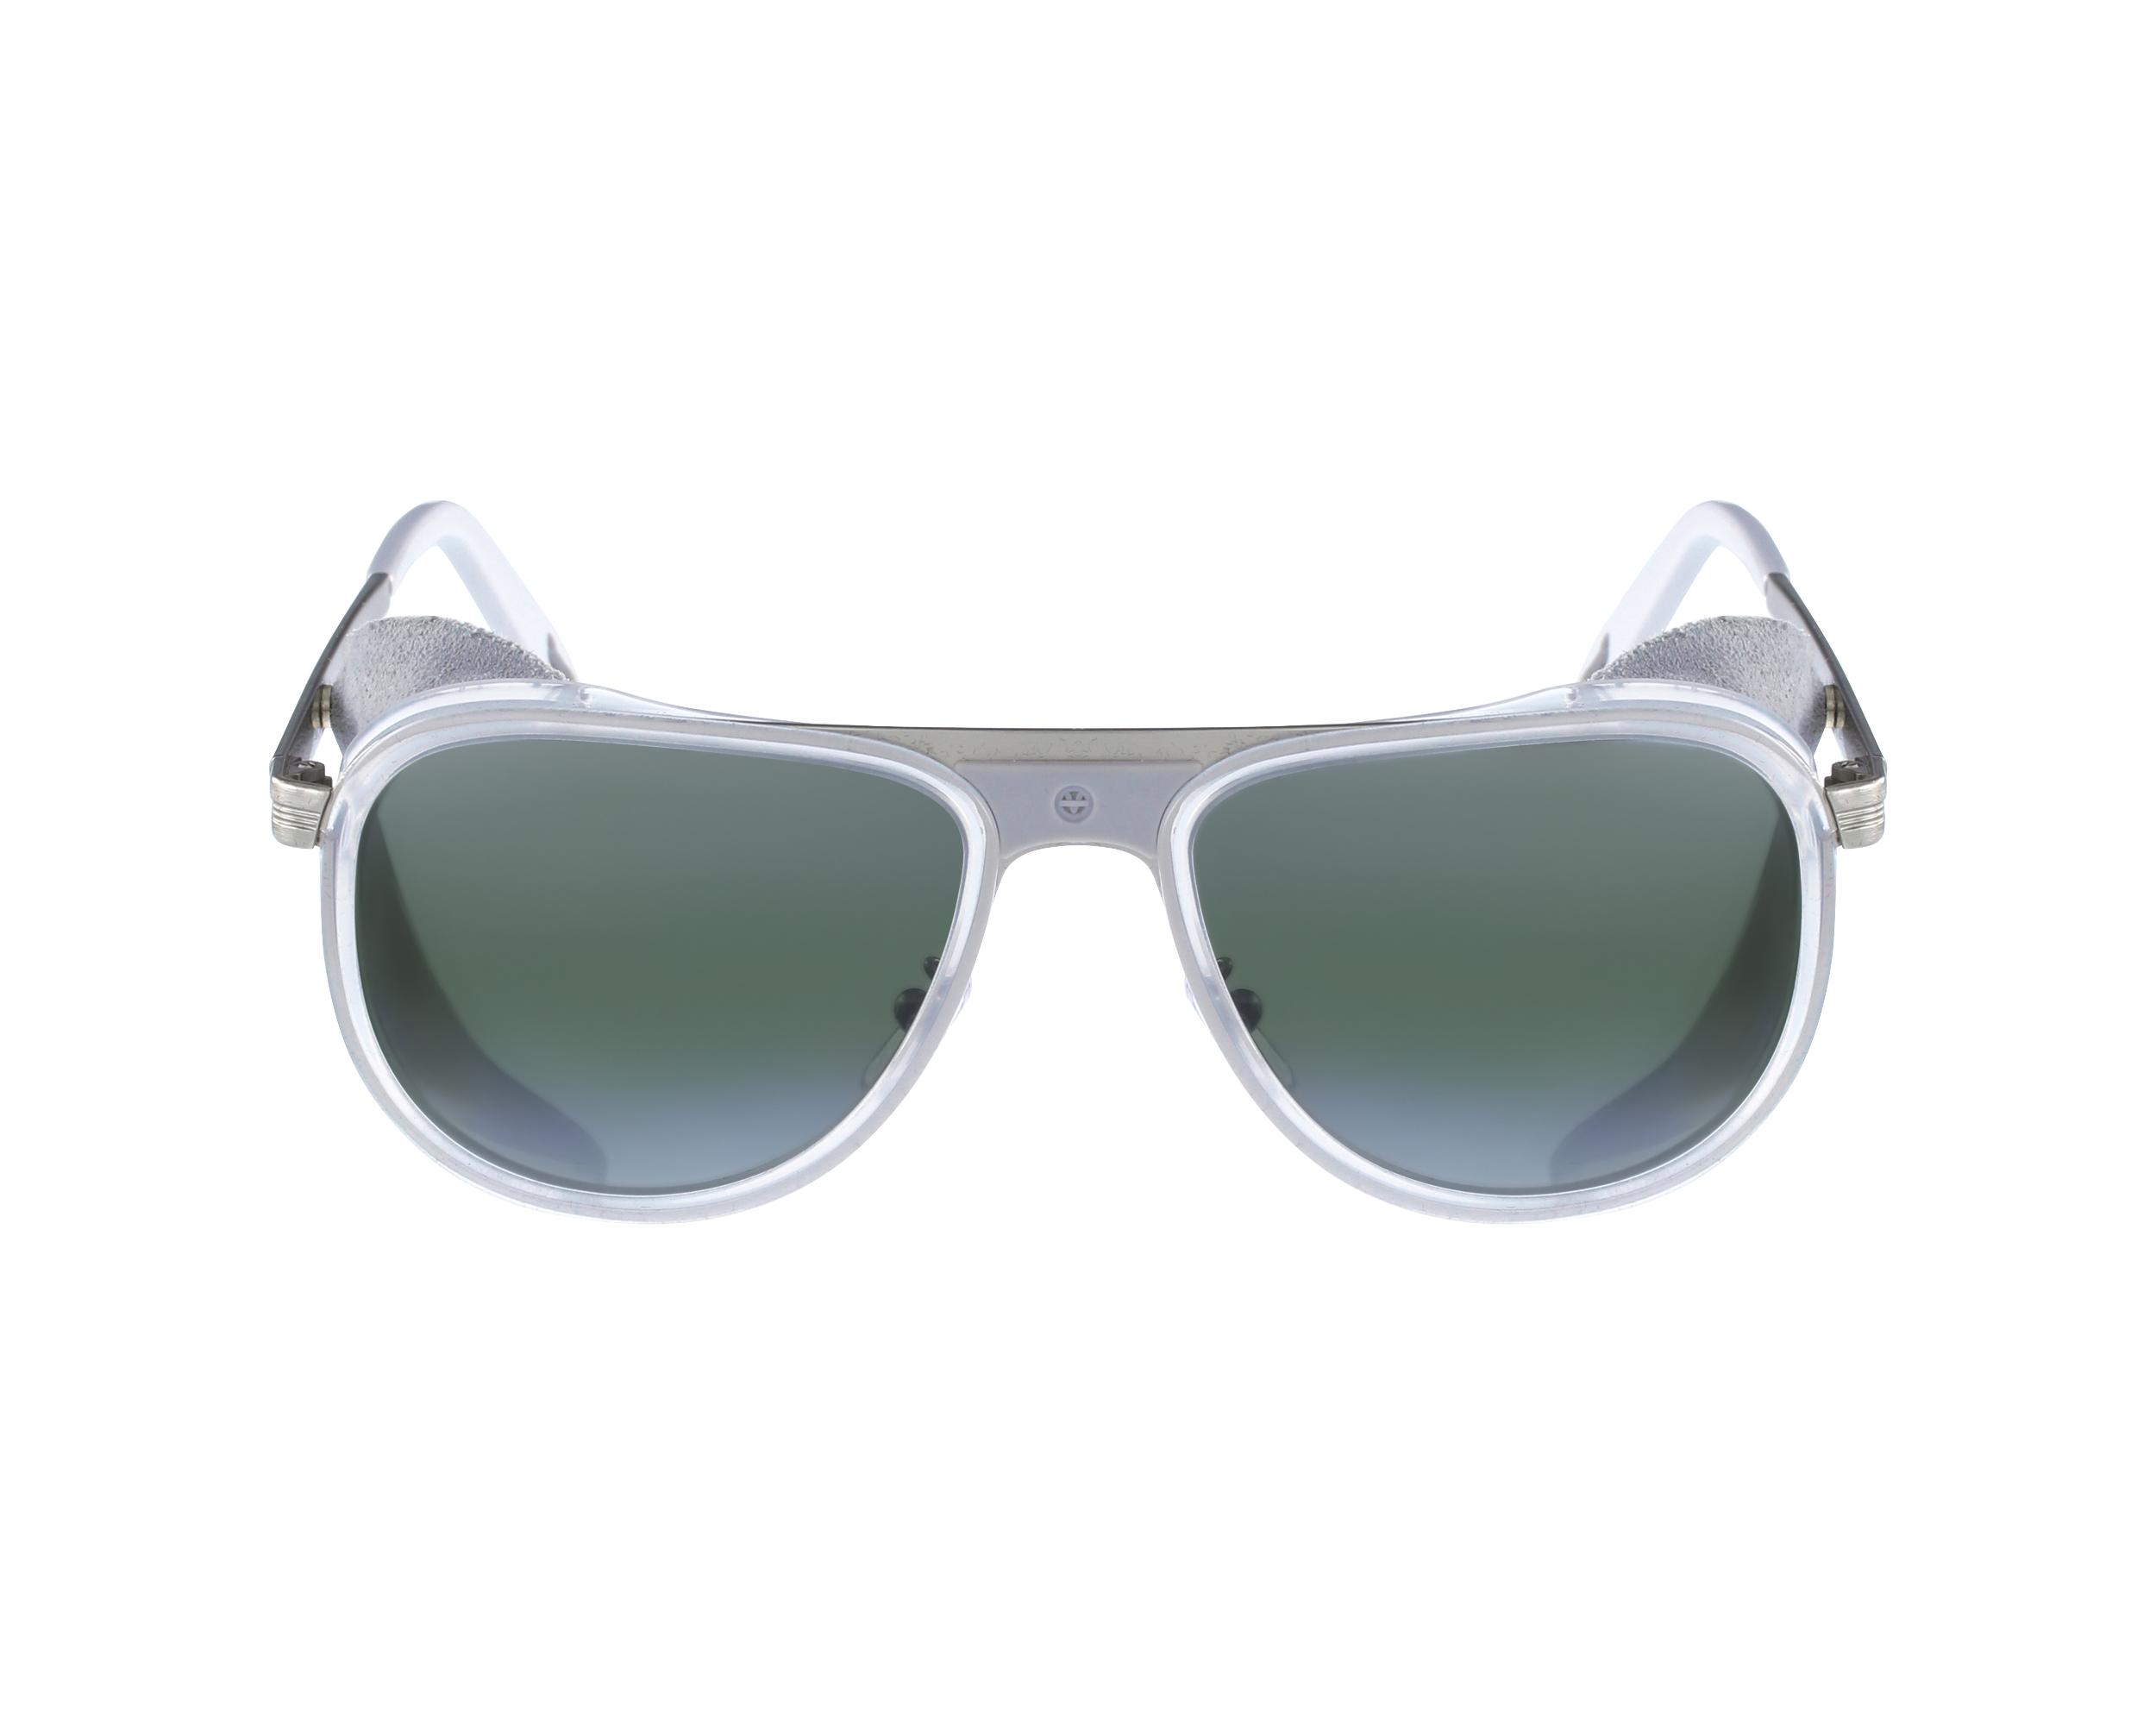 Vuarnet Sonnenbrillen VL 1315 0003 ezPjPBCjd